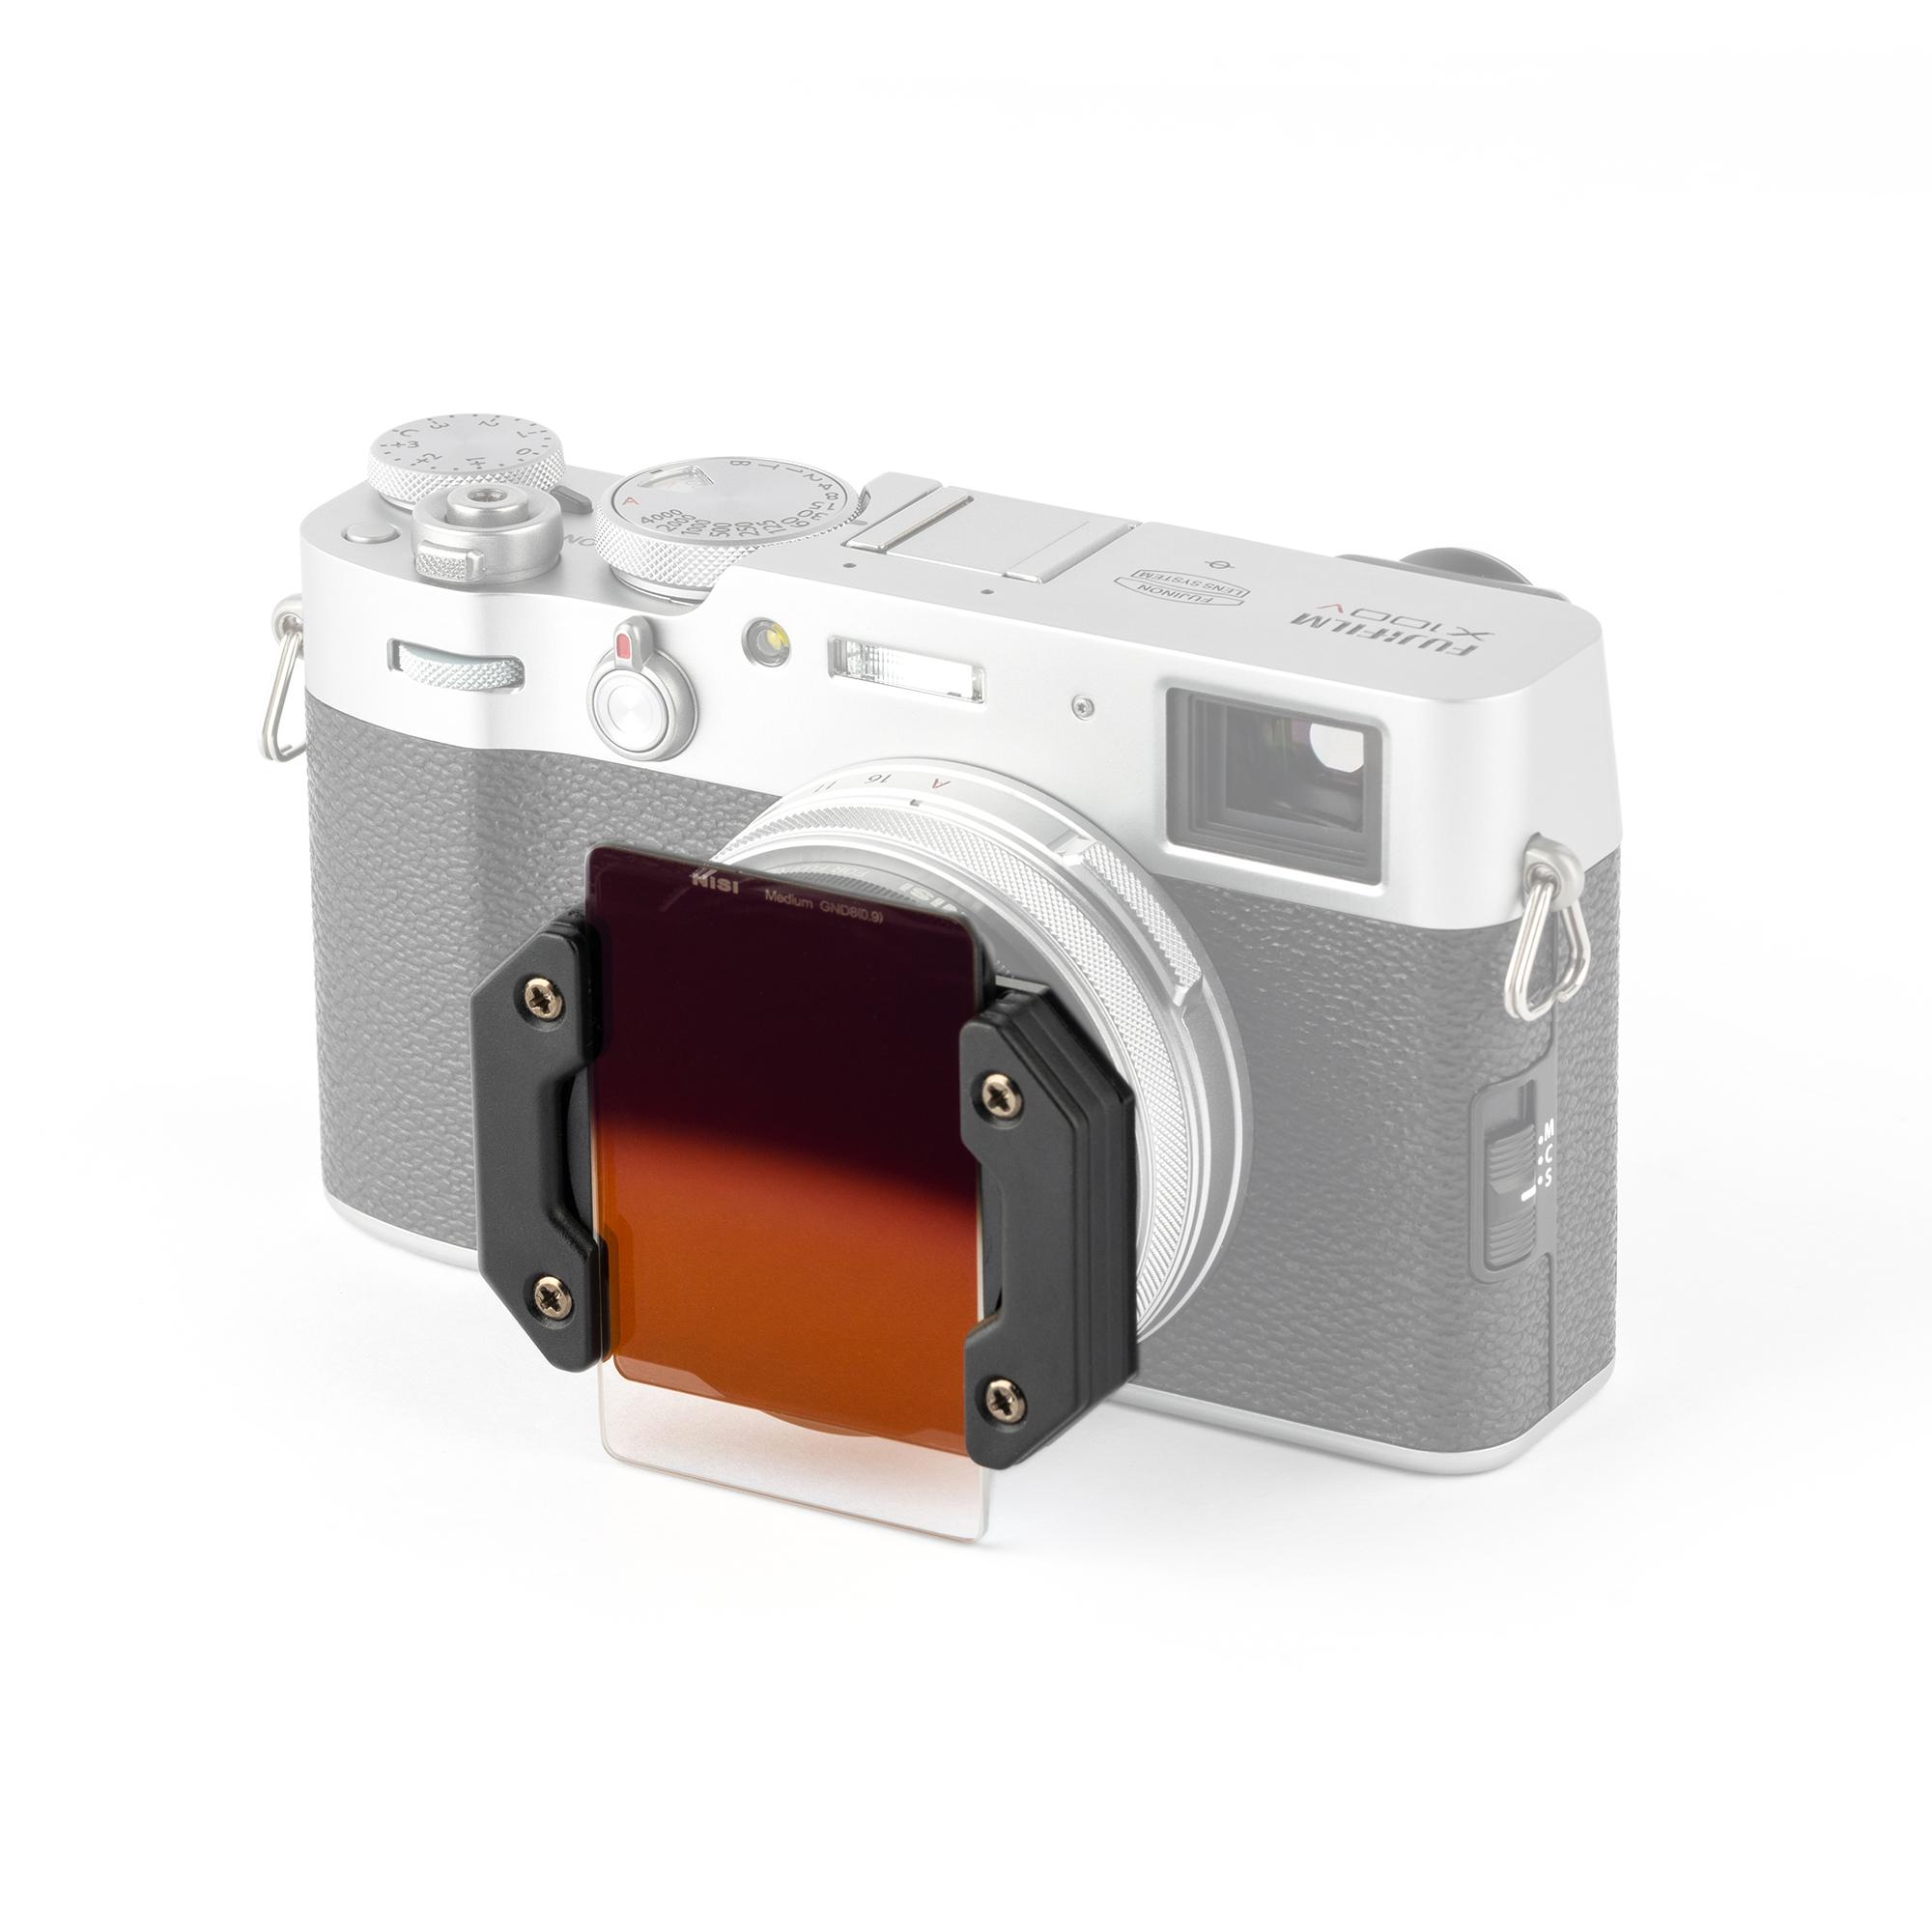 Fujifilm X100 Filter System